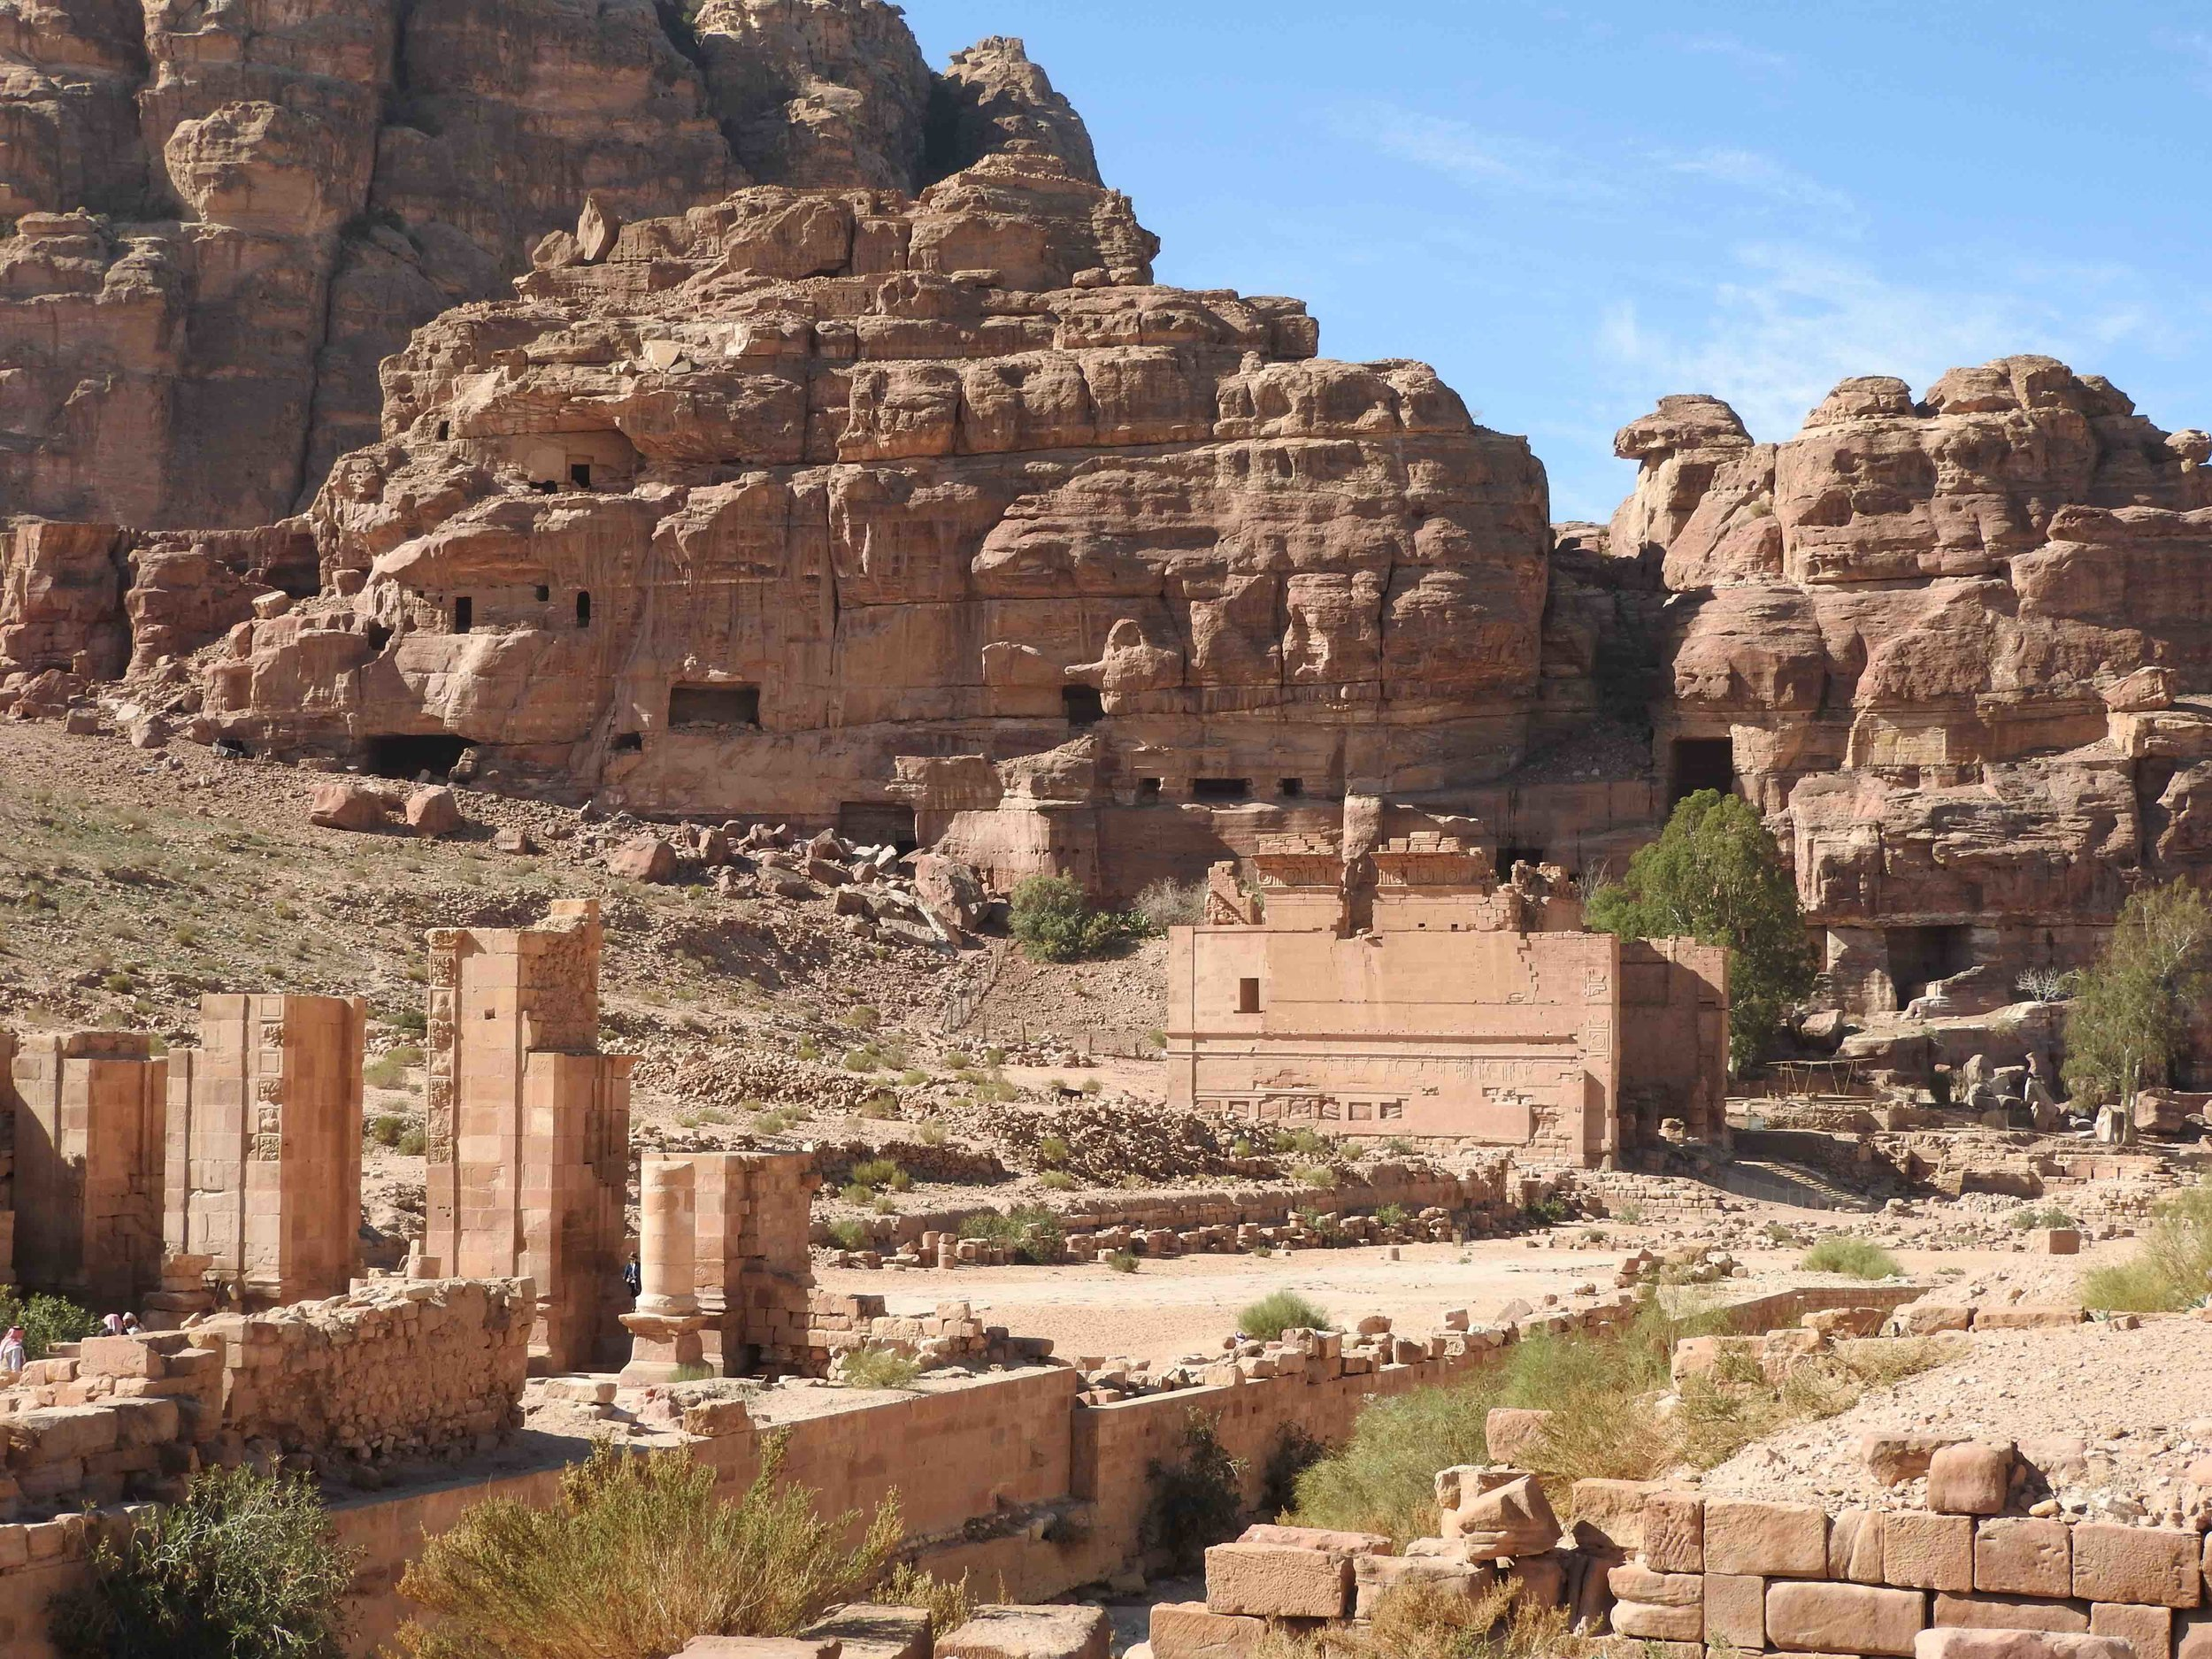 View of Royal Tombs